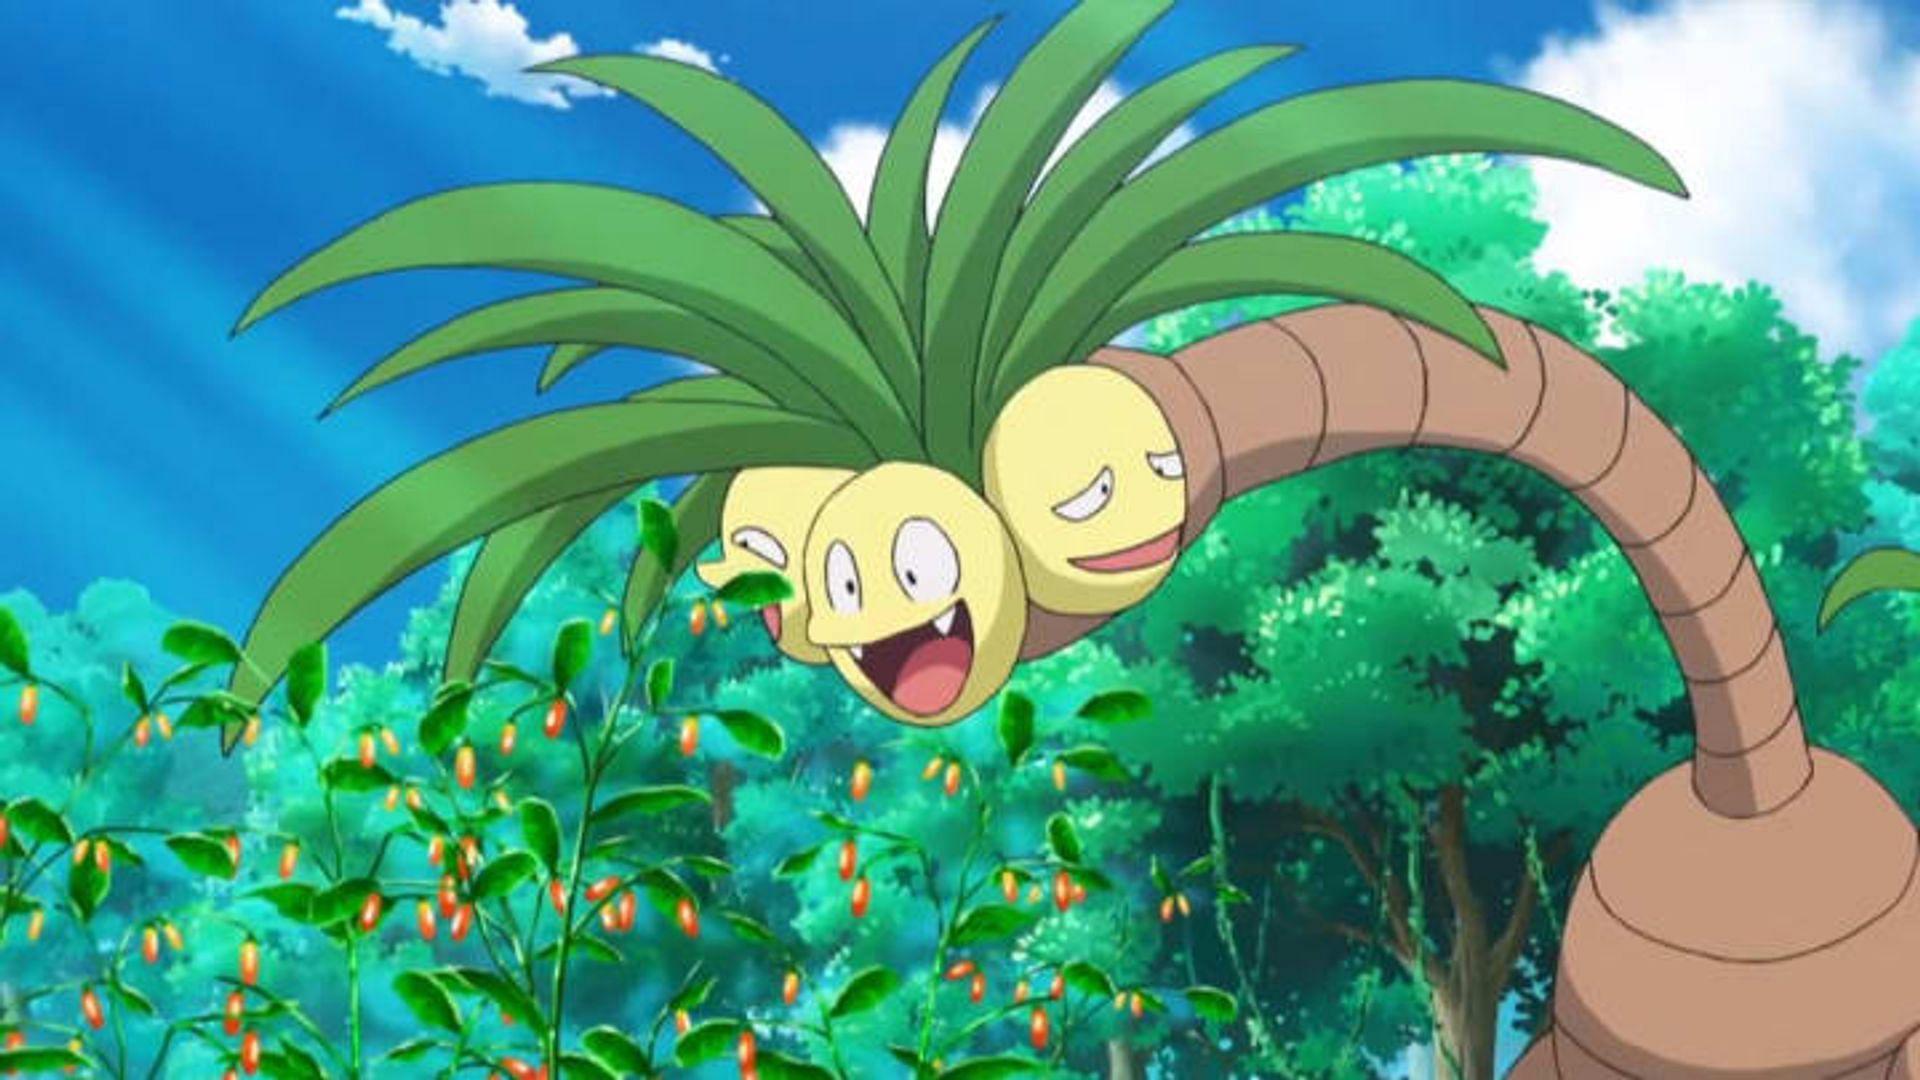 Alolan Exeggutor as it appears in the anime (Image via The Pokemon Company)